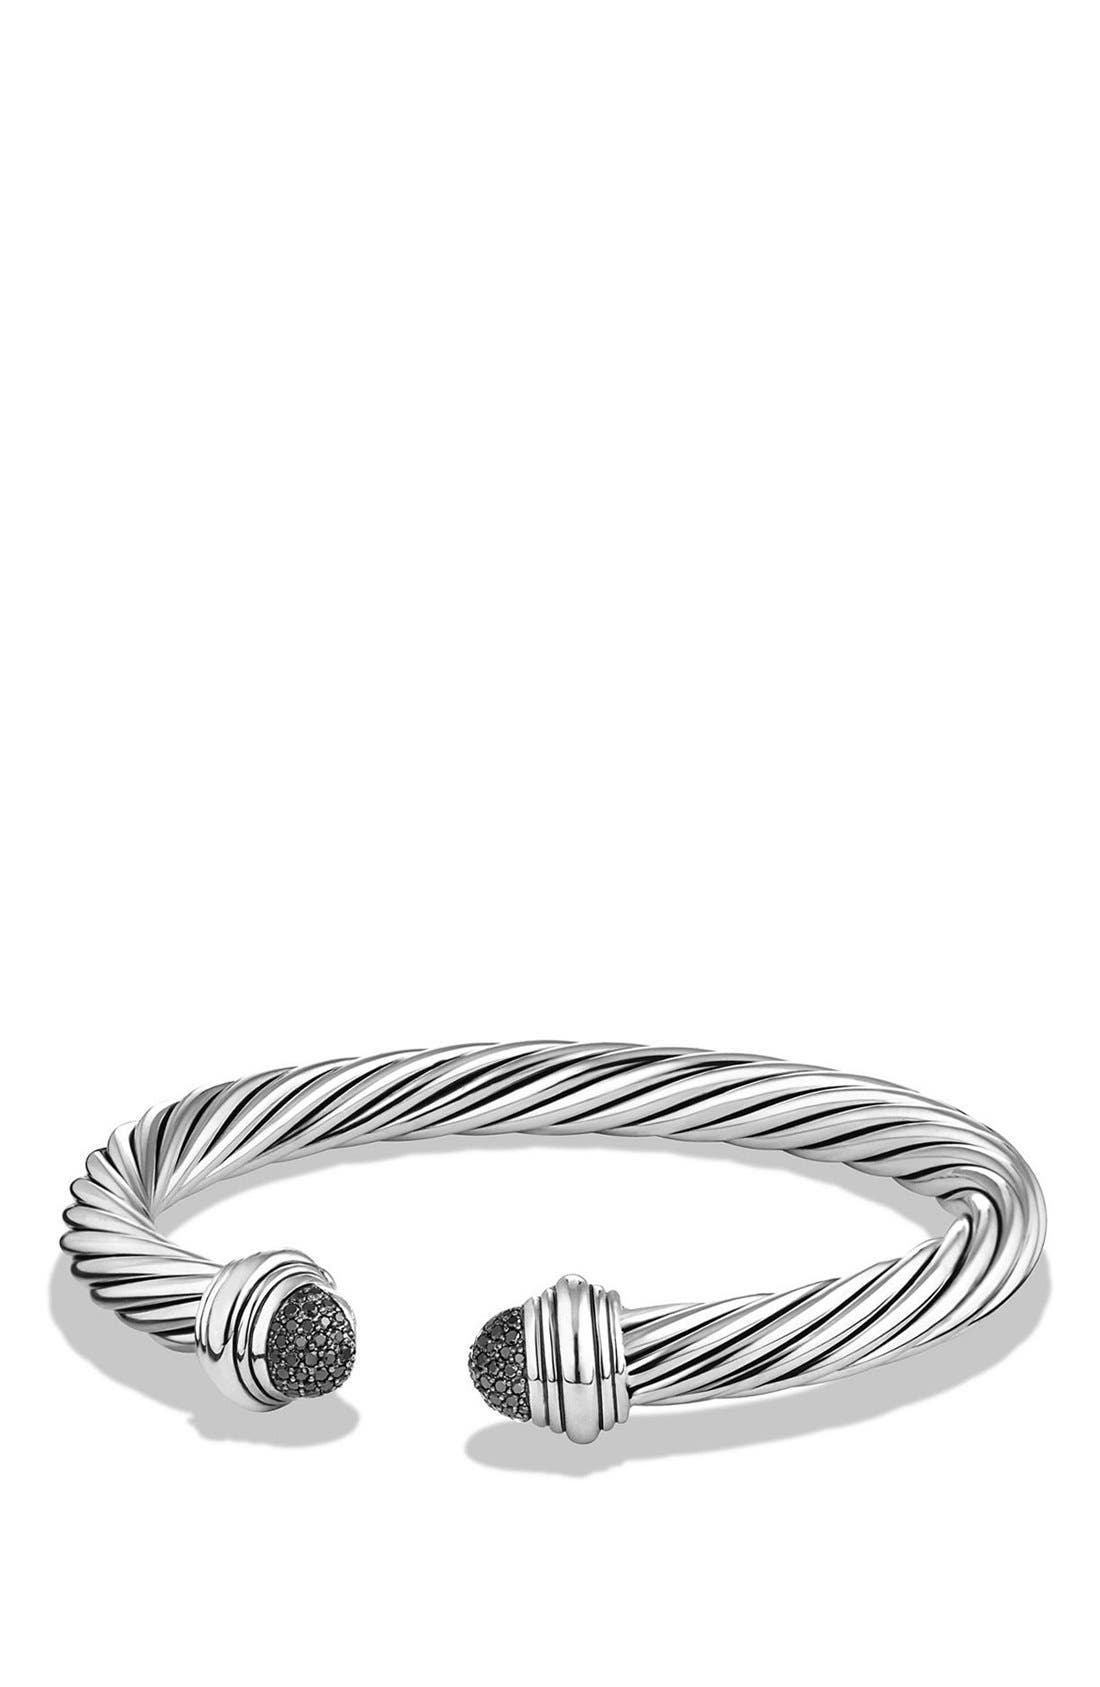 DAVID YURMAN Cable Classics Bracelet with Black Diamonds